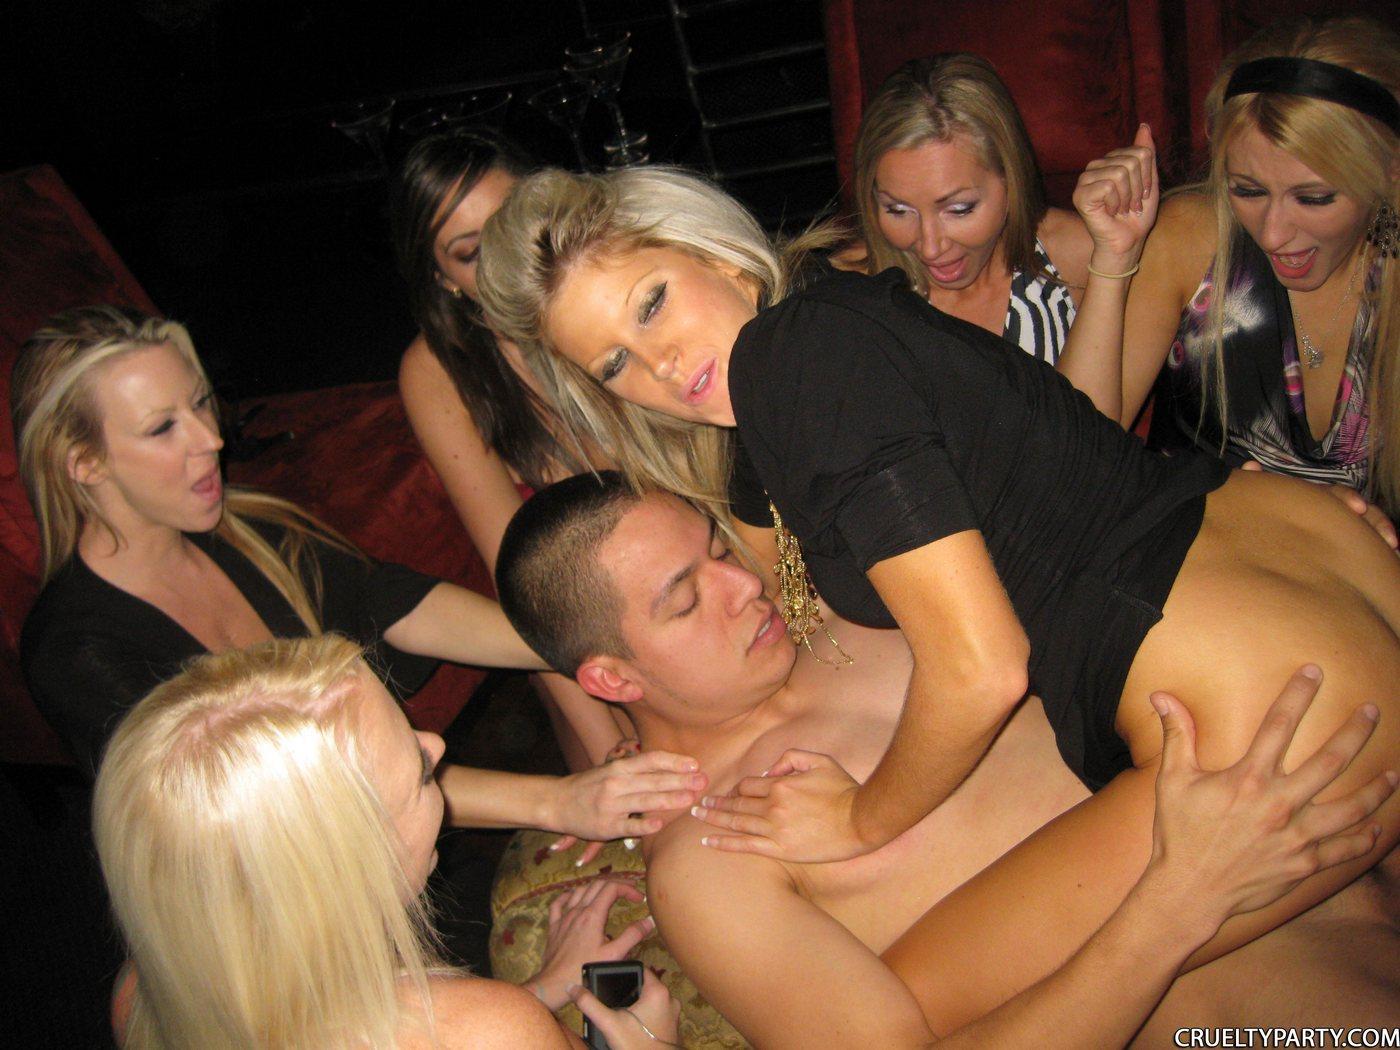 Секс дивишник онлайн 19 фотография